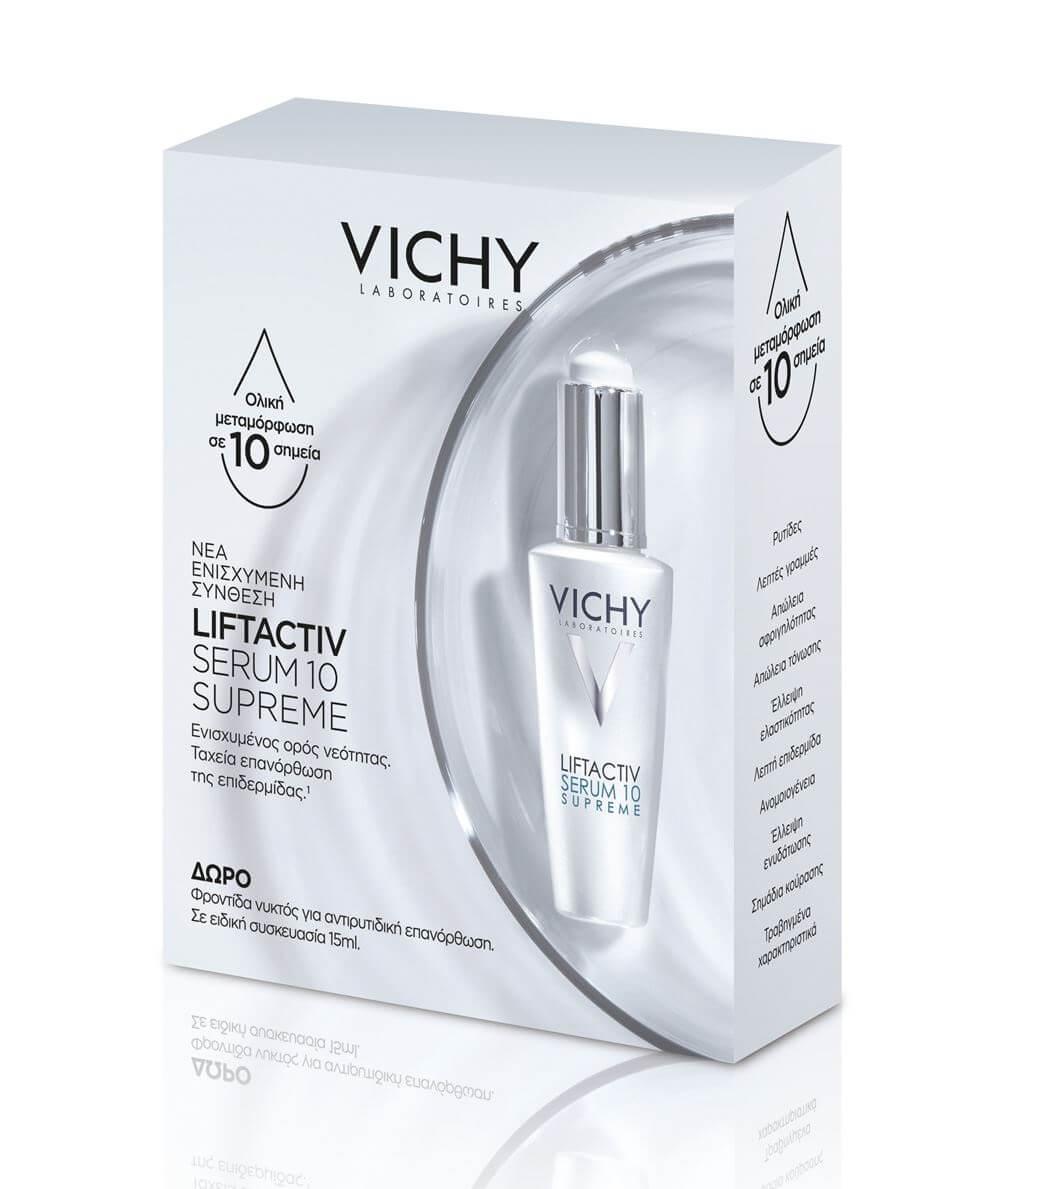 Vichy Liftactiv Serum 10 Supreme 30ml + Δώρο Liftactiv Night Supreme 15ml